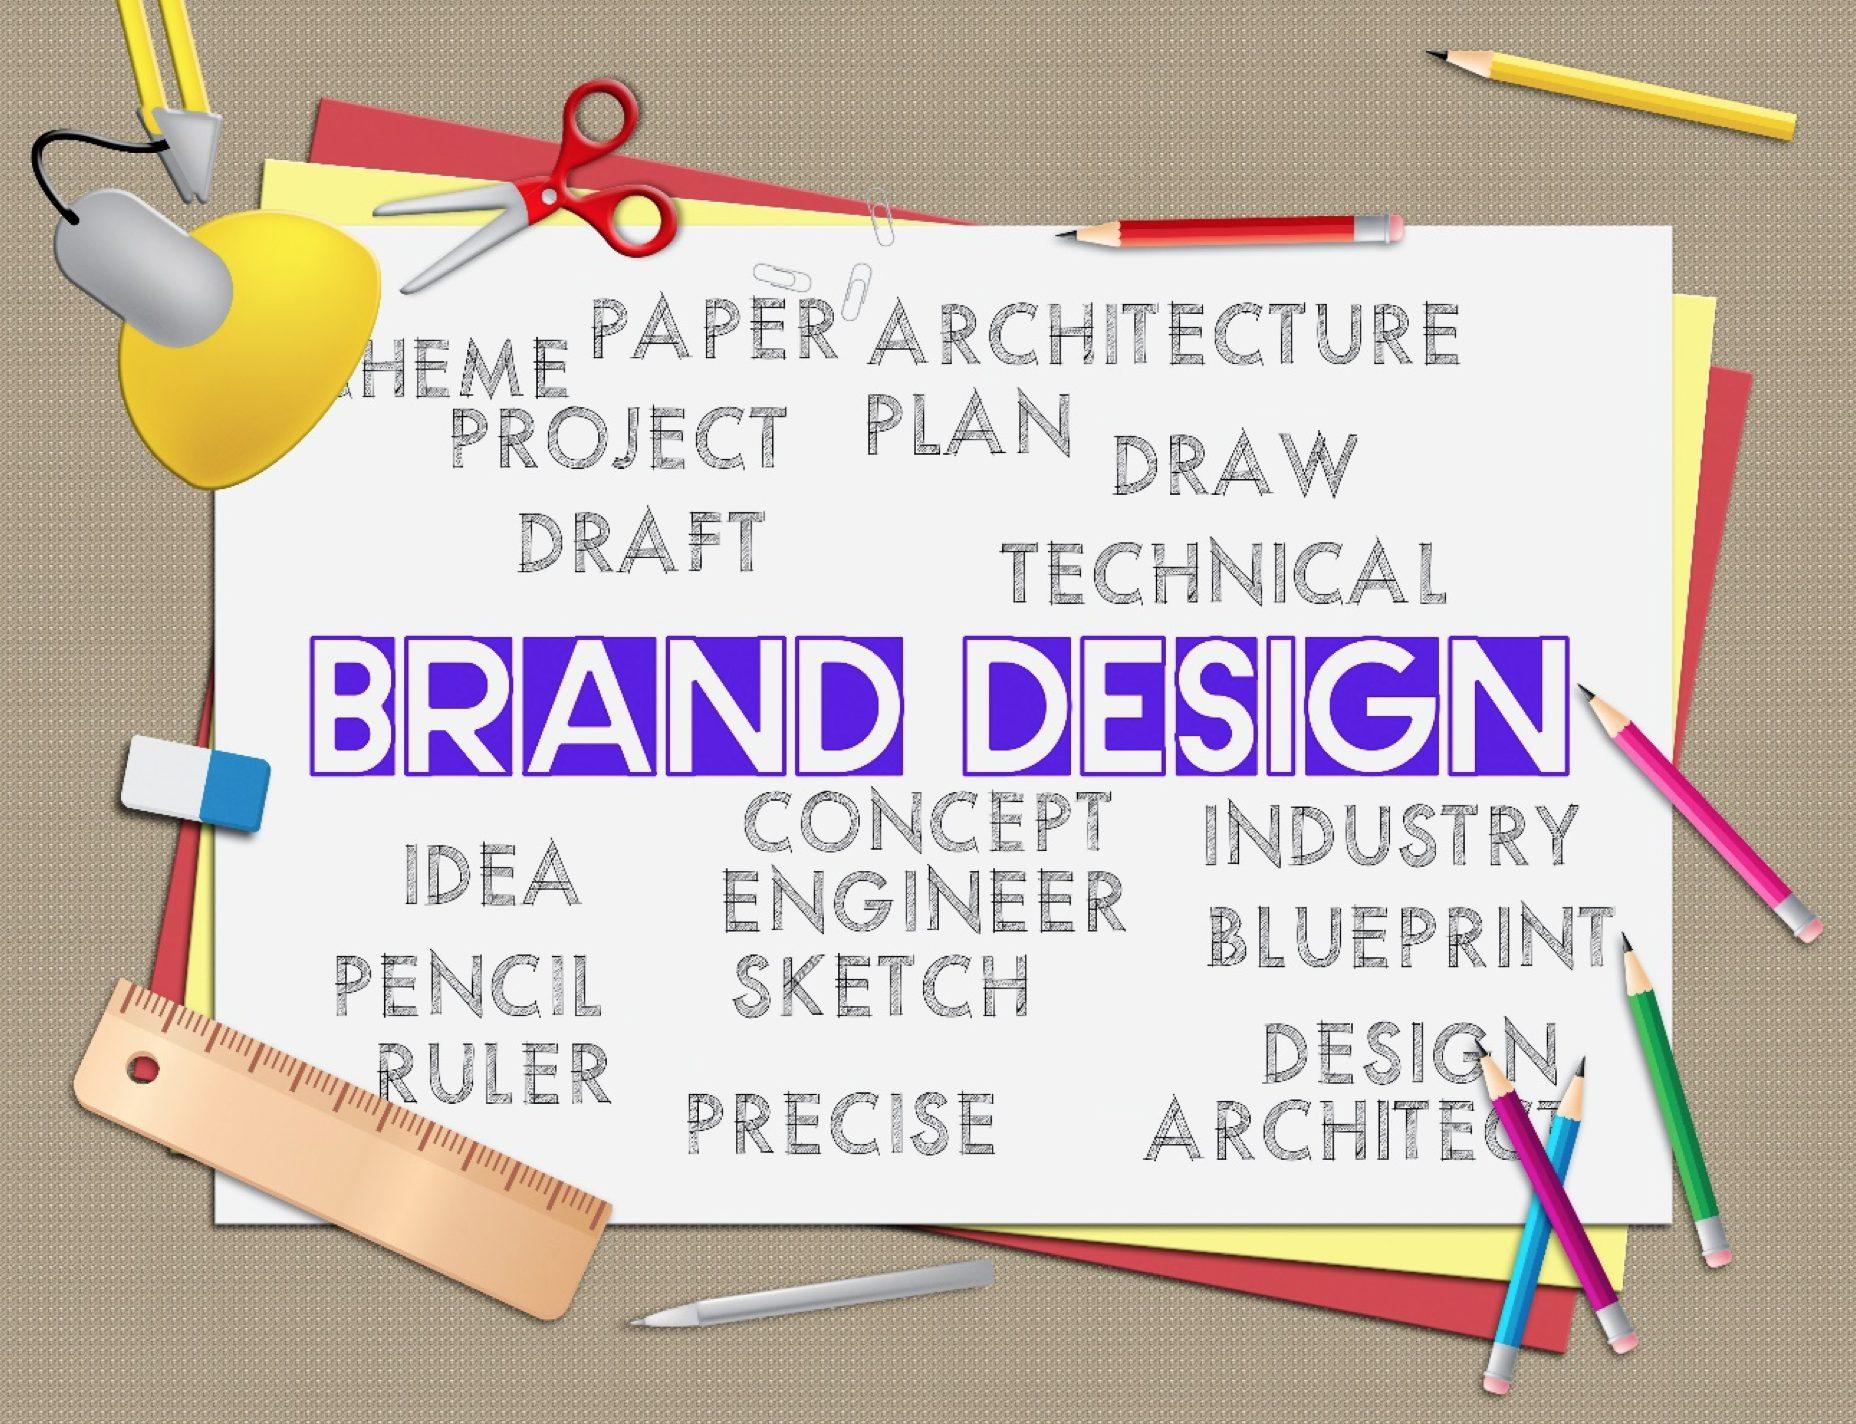 Brand Design indicates artwork idea and branding